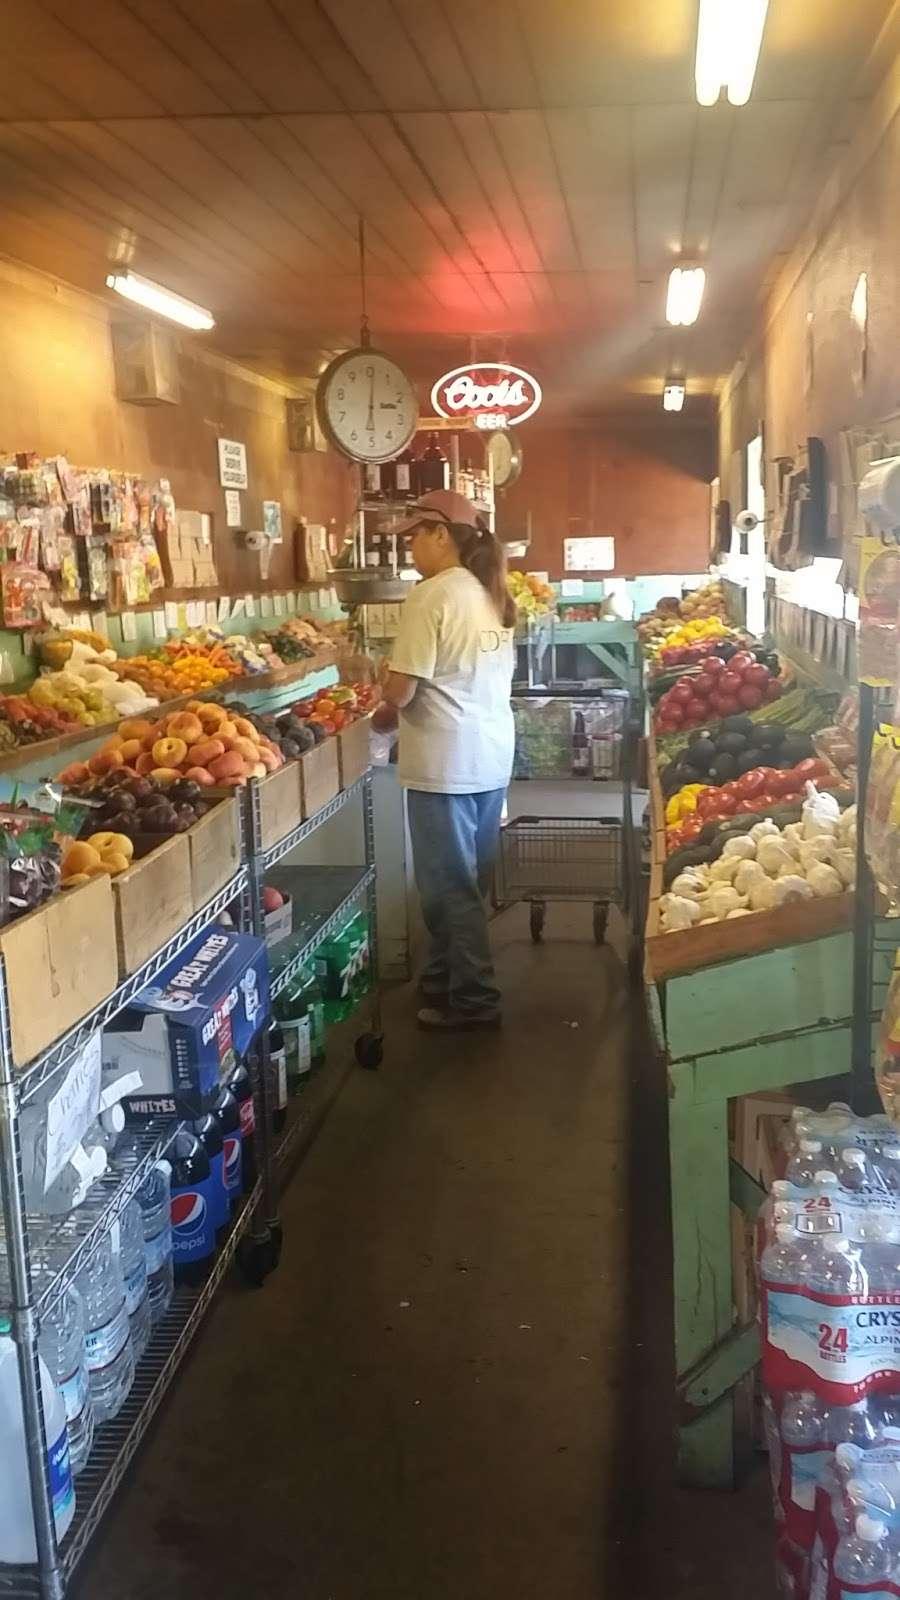 Palace of Fruit - store  | Photo 6 of 10 | Address: 8 Ely Rd N, Petaluma, CA 94954, USA | Phone: (707) 795-5311